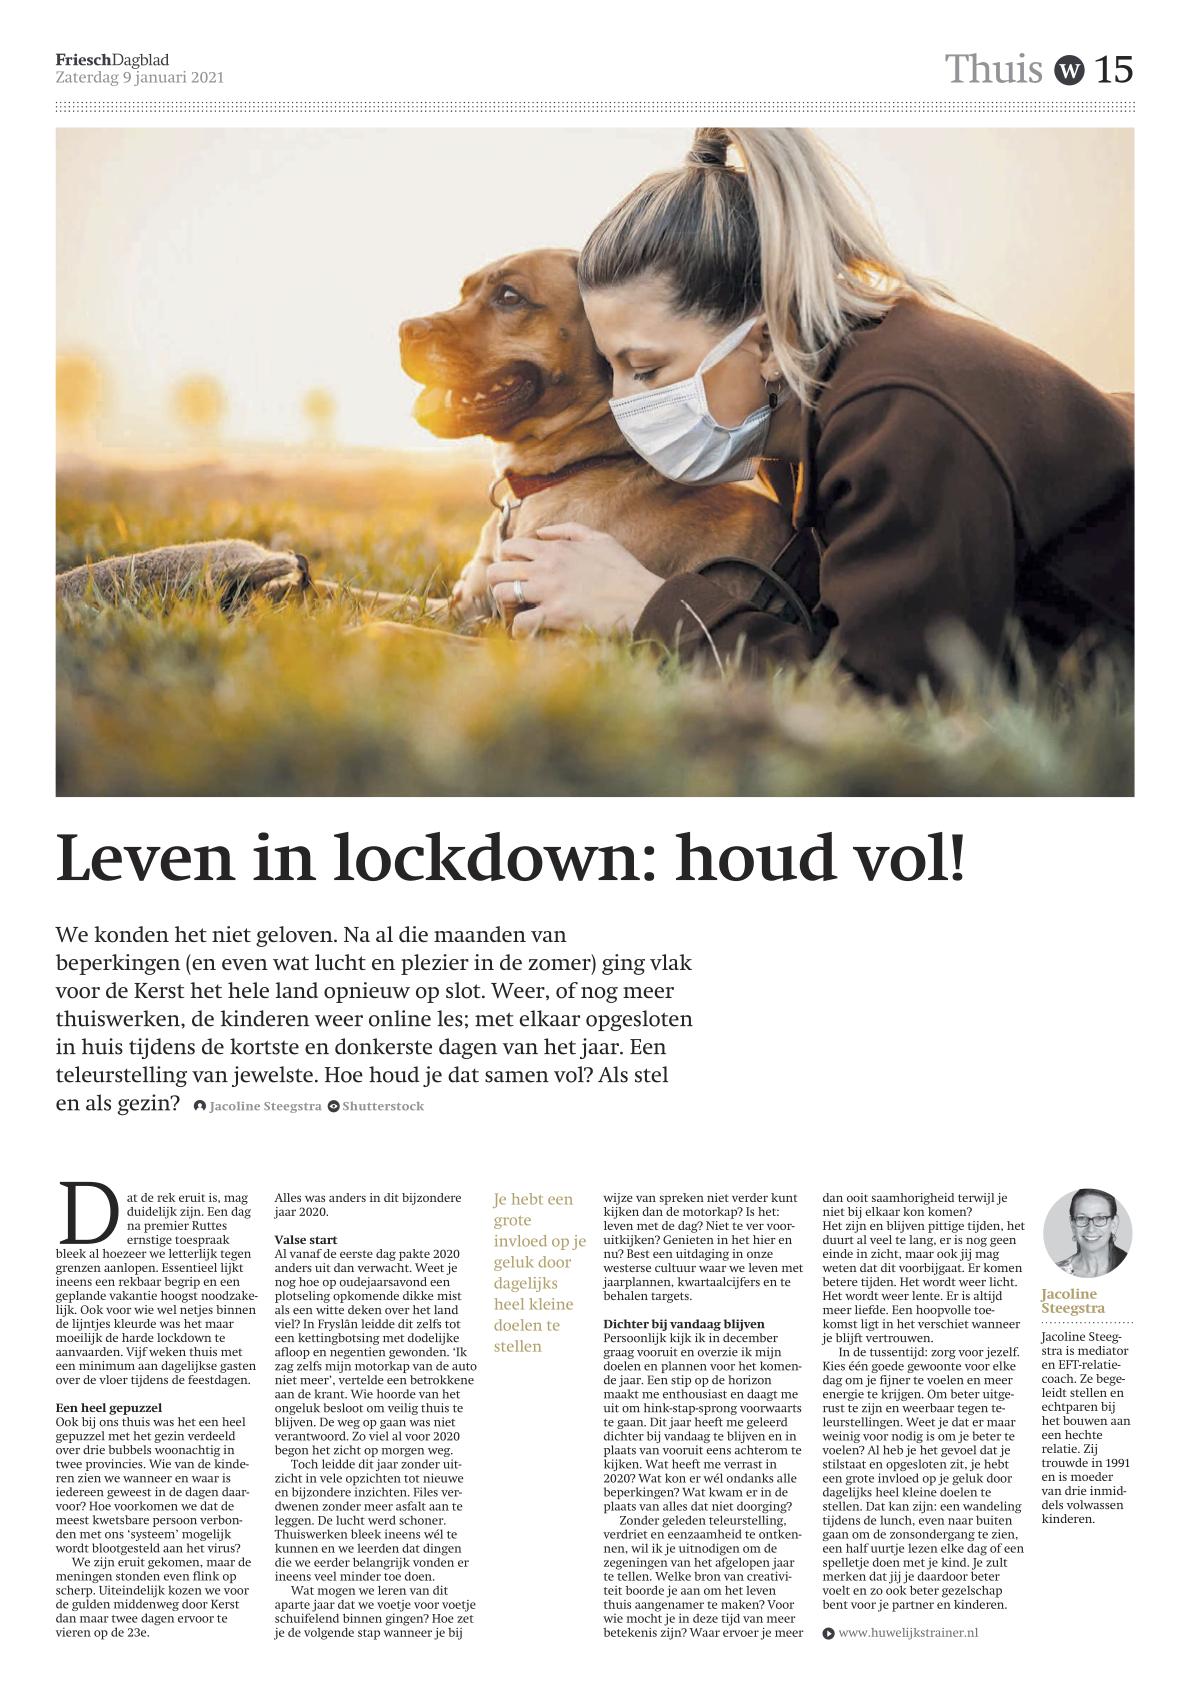 Leven in lockdown: houd vol